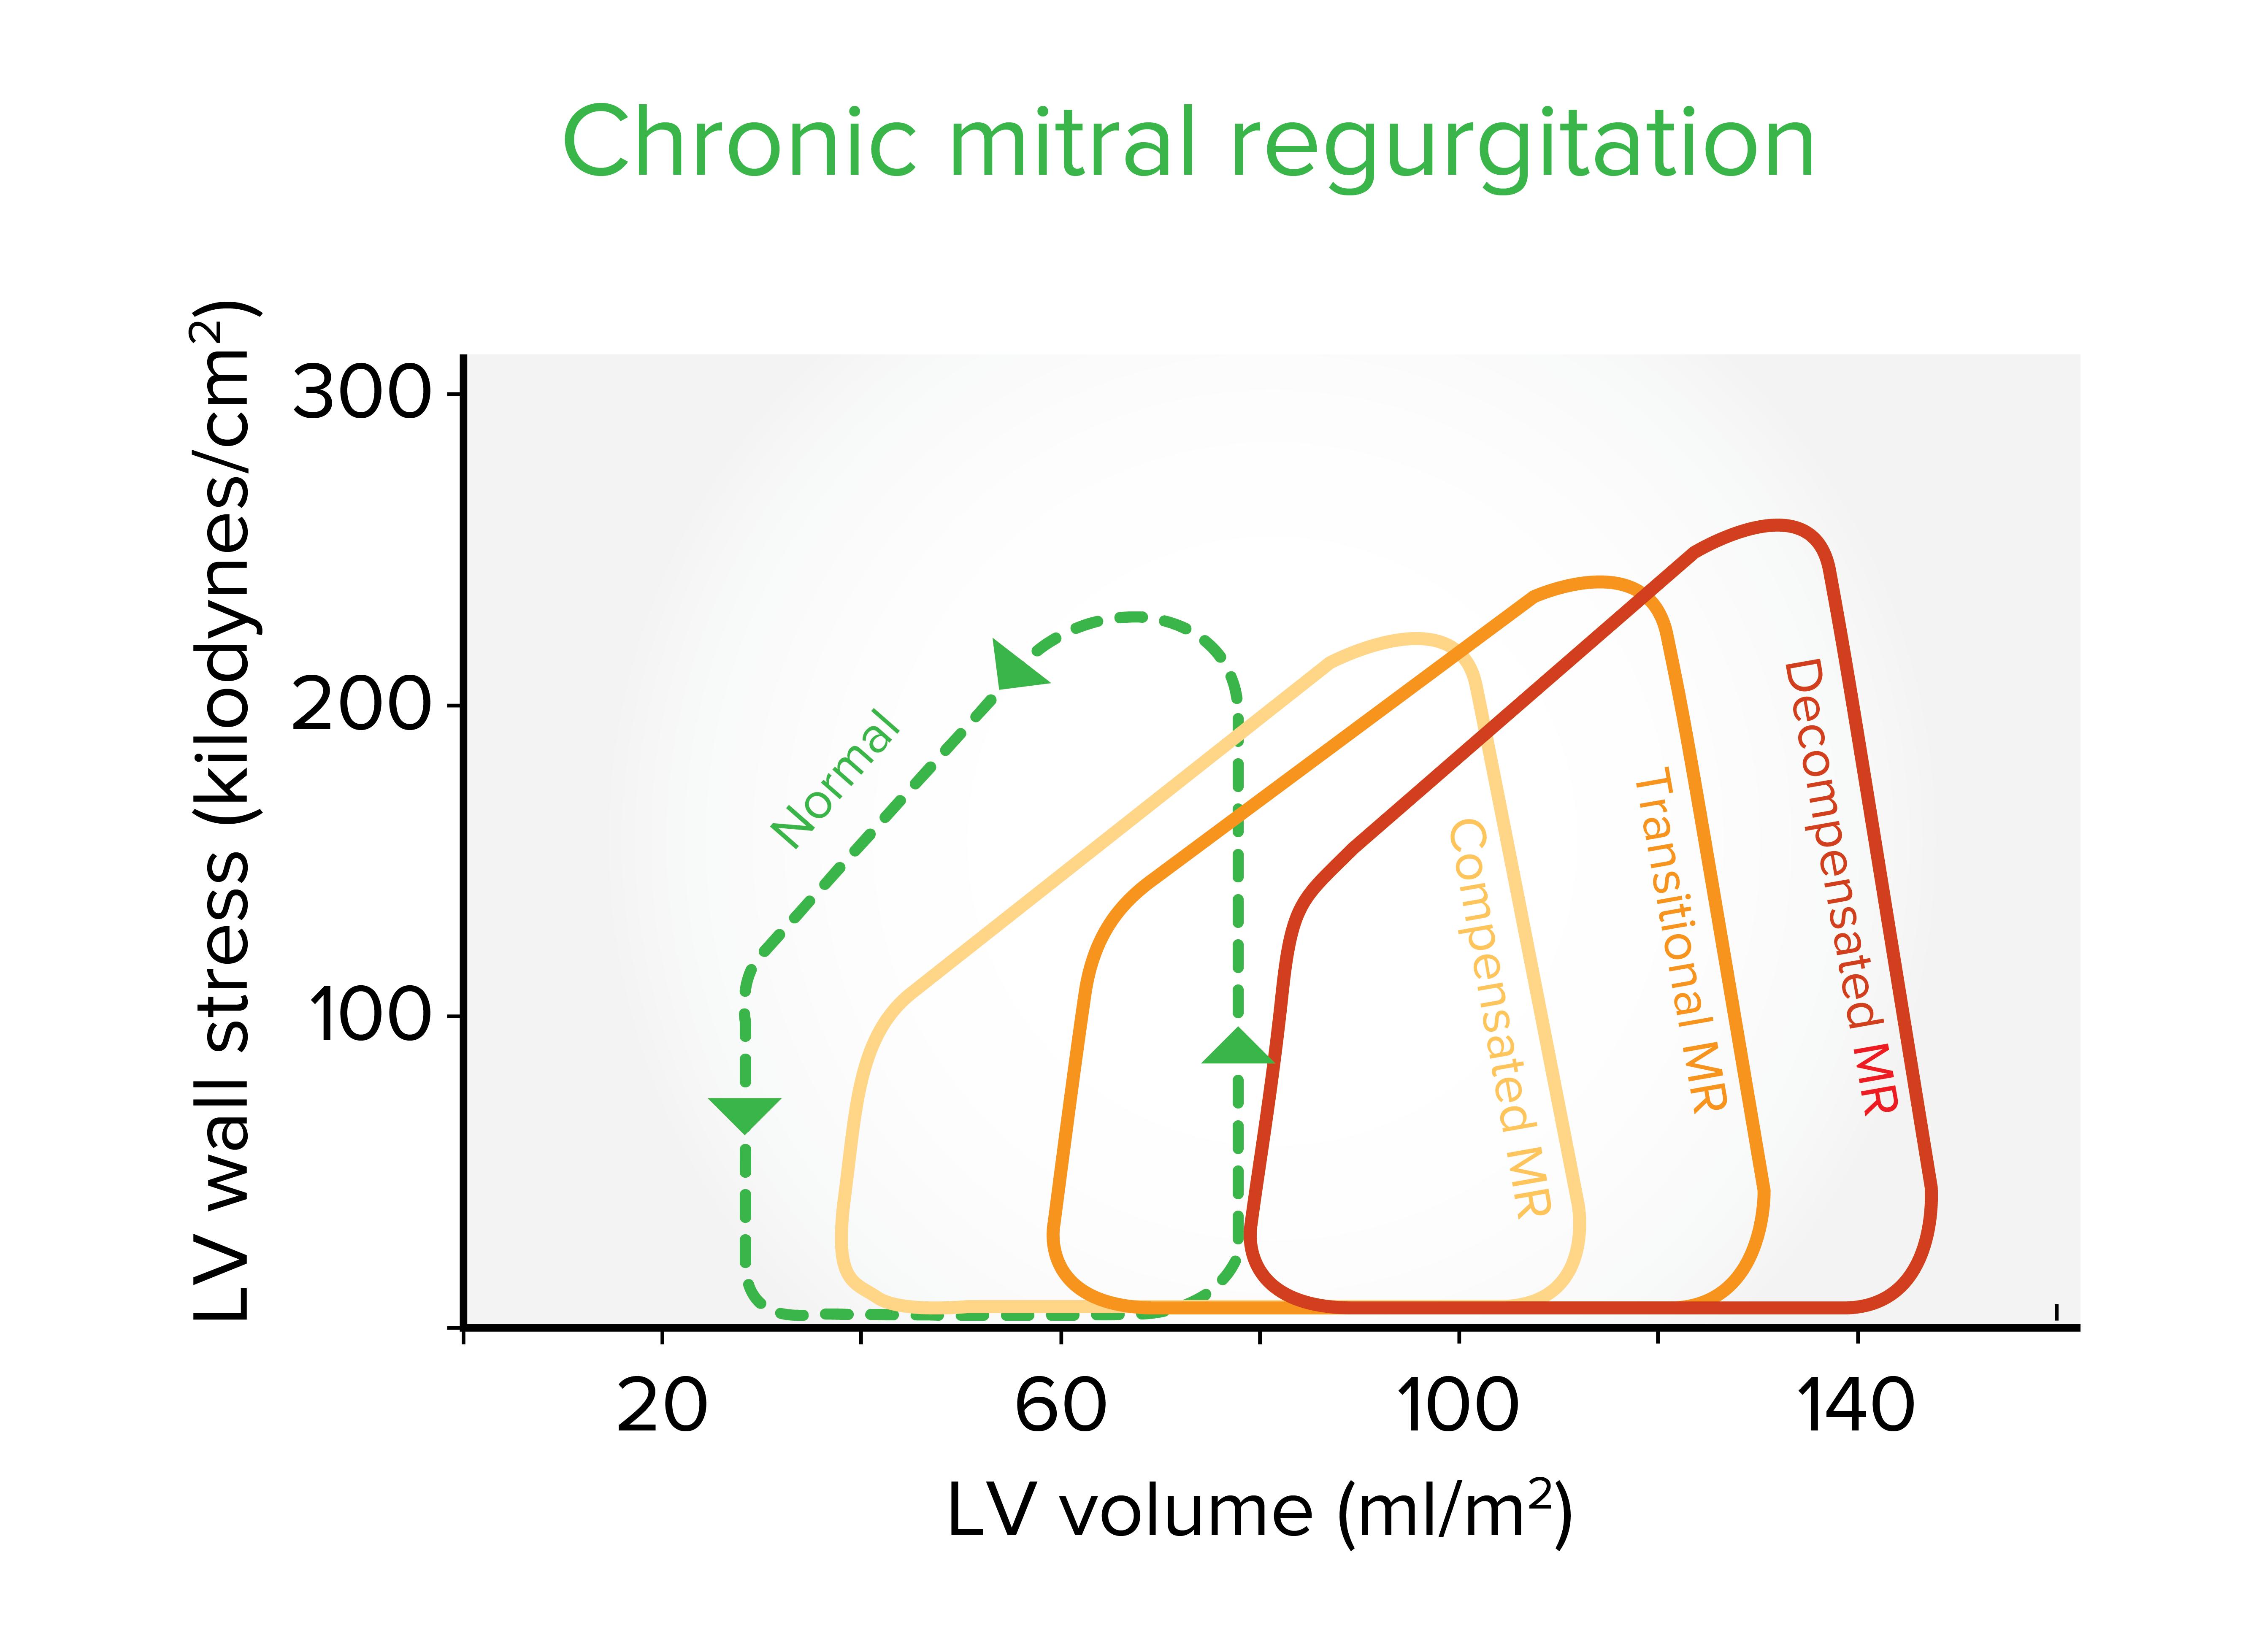 Chronic mitral regurgitation